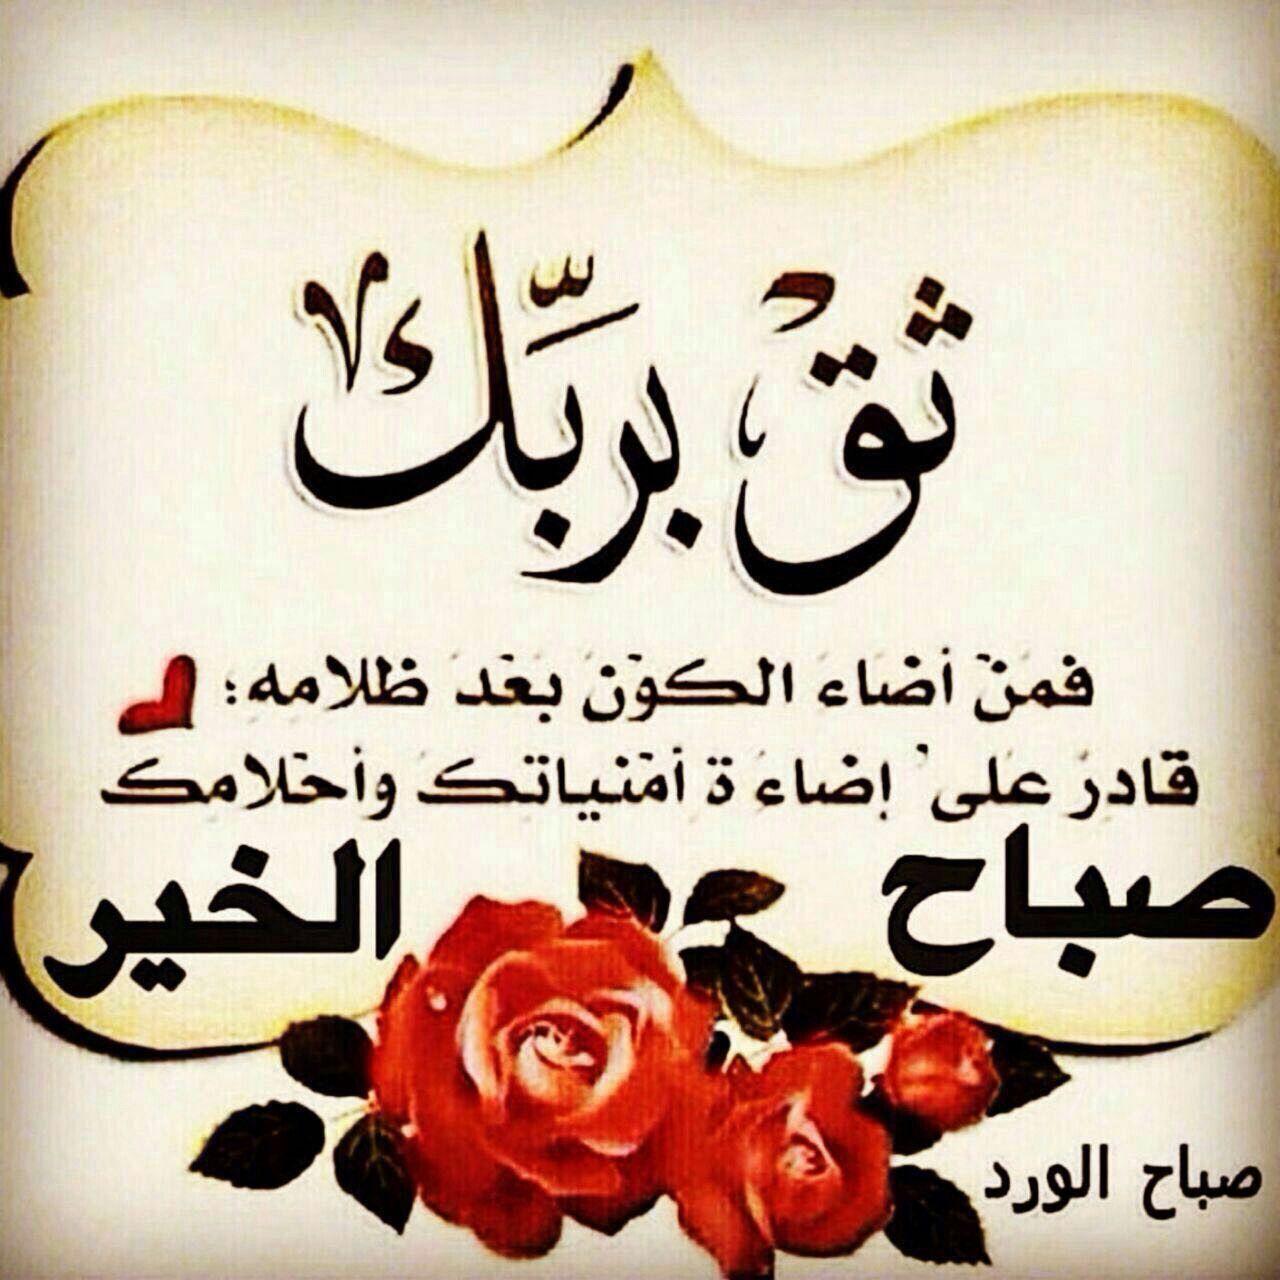 Pin By Chamsdine Chams On صباح مساء الخير Calligraphy Photo Arabic Calligraphy